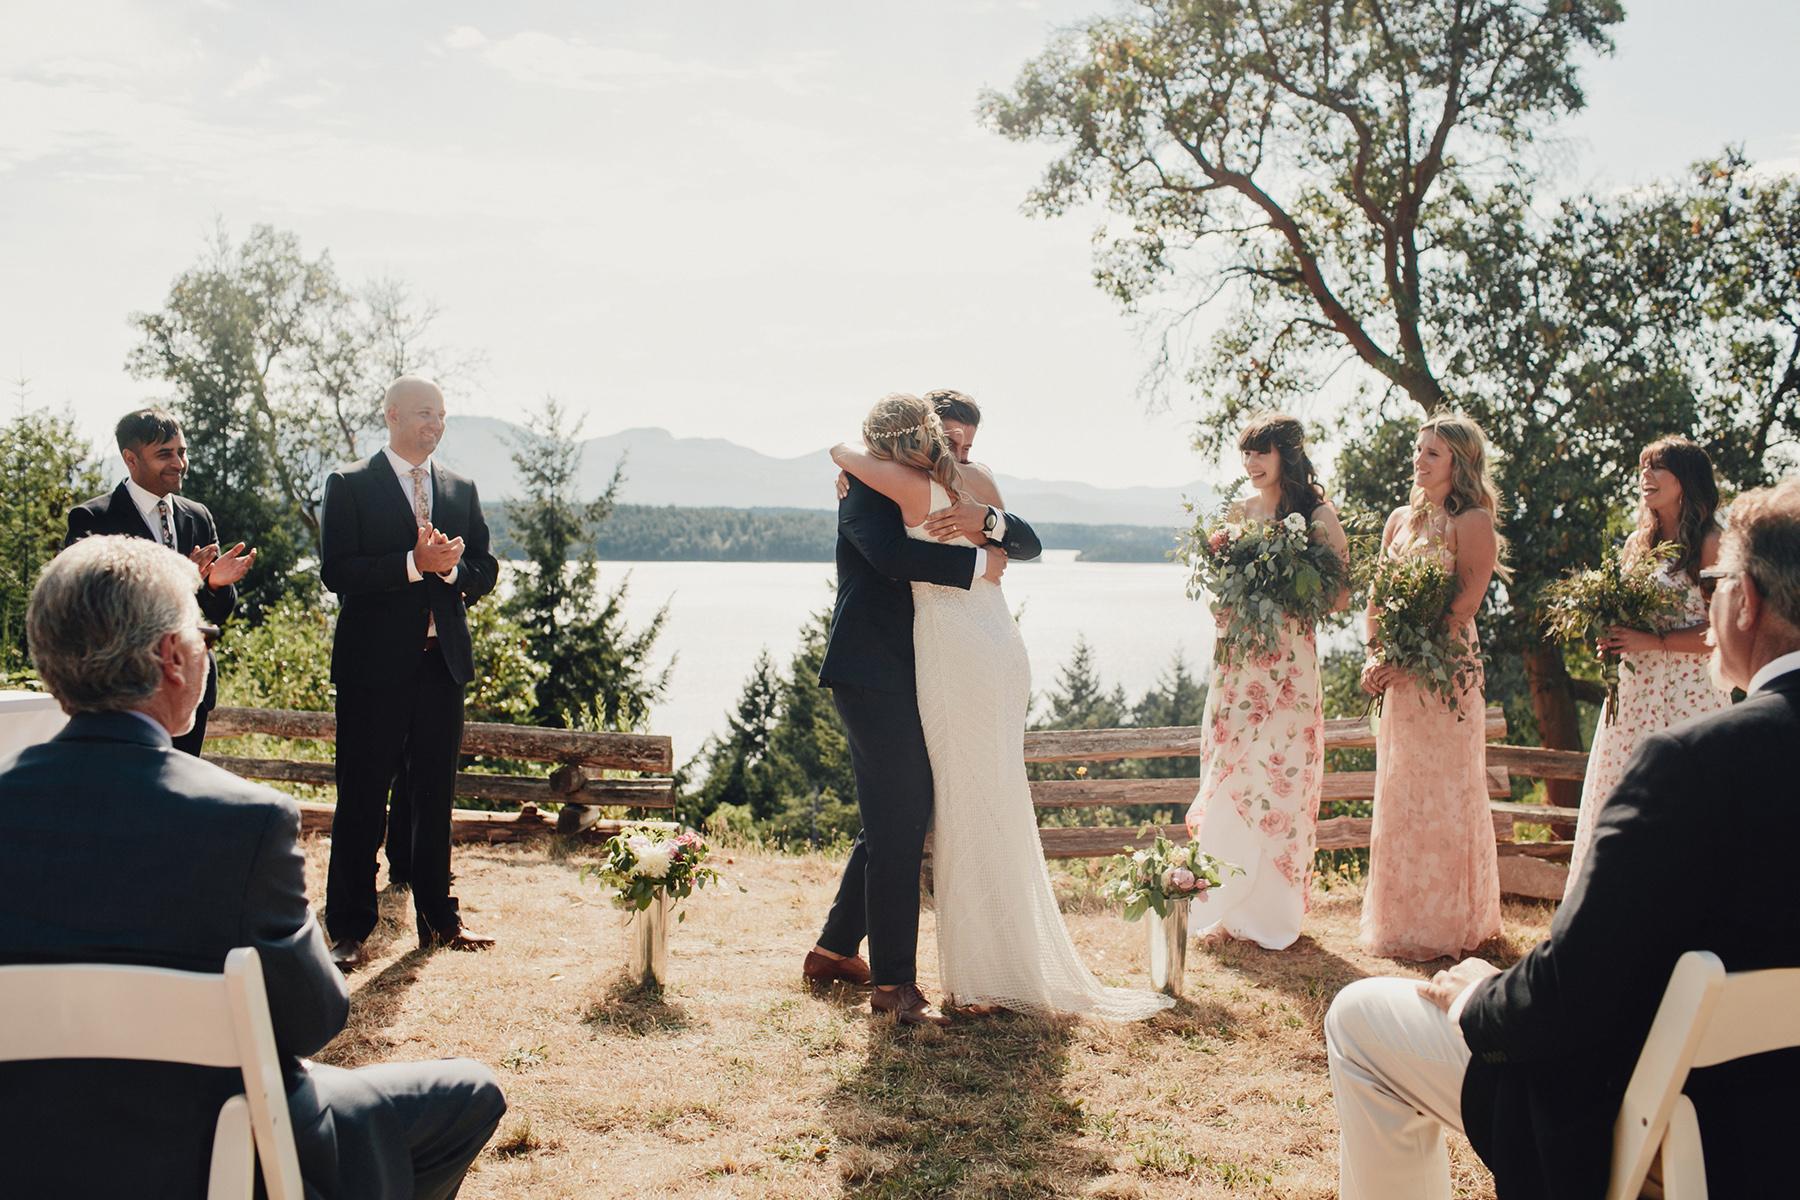 galiano-island-bodega-destination-wedding-0067.JPG